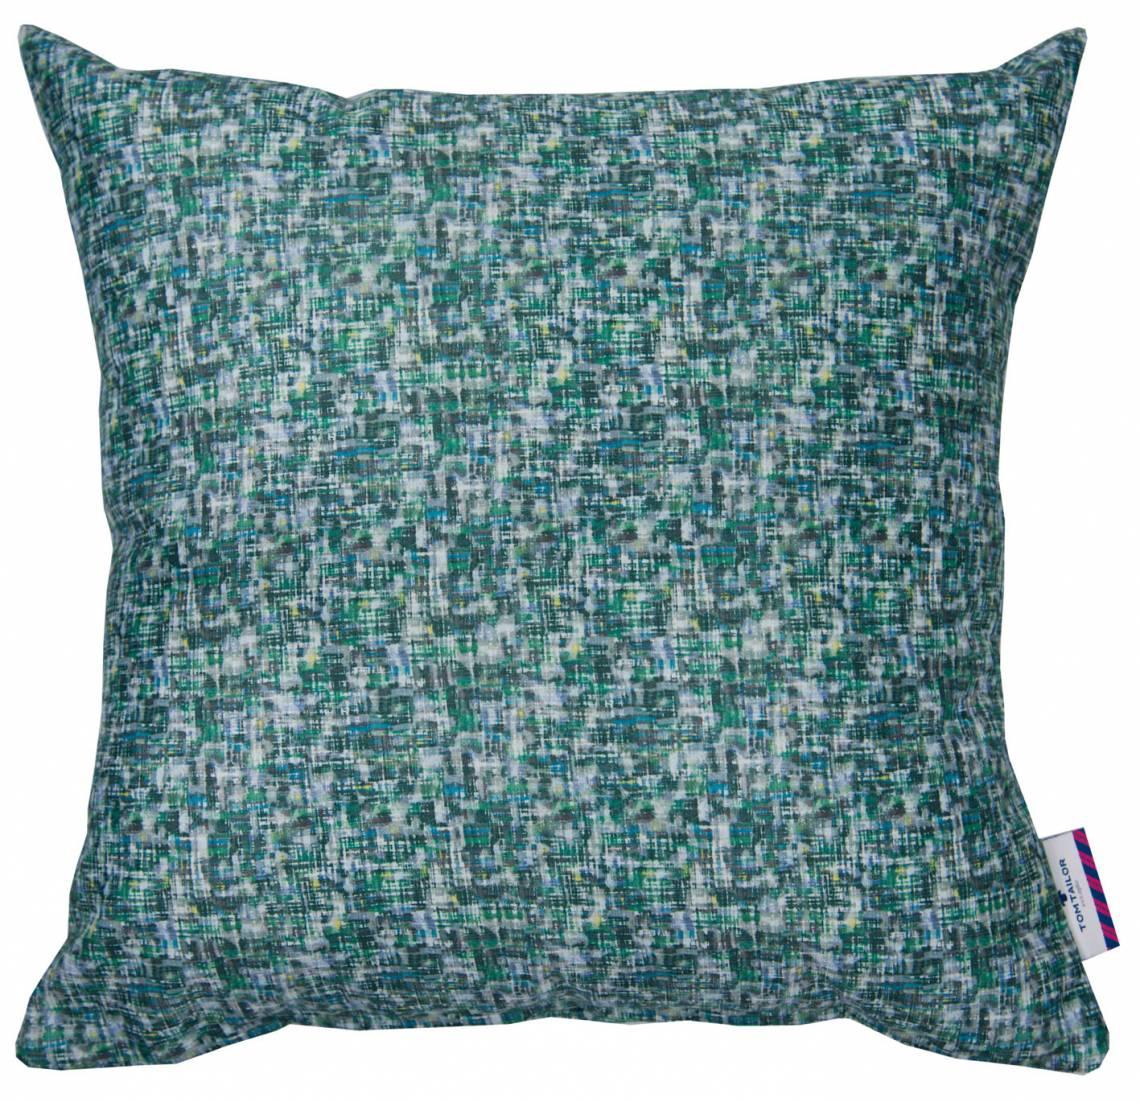 Tom Tailor Home Motley Green Kissenhülle blau/grün